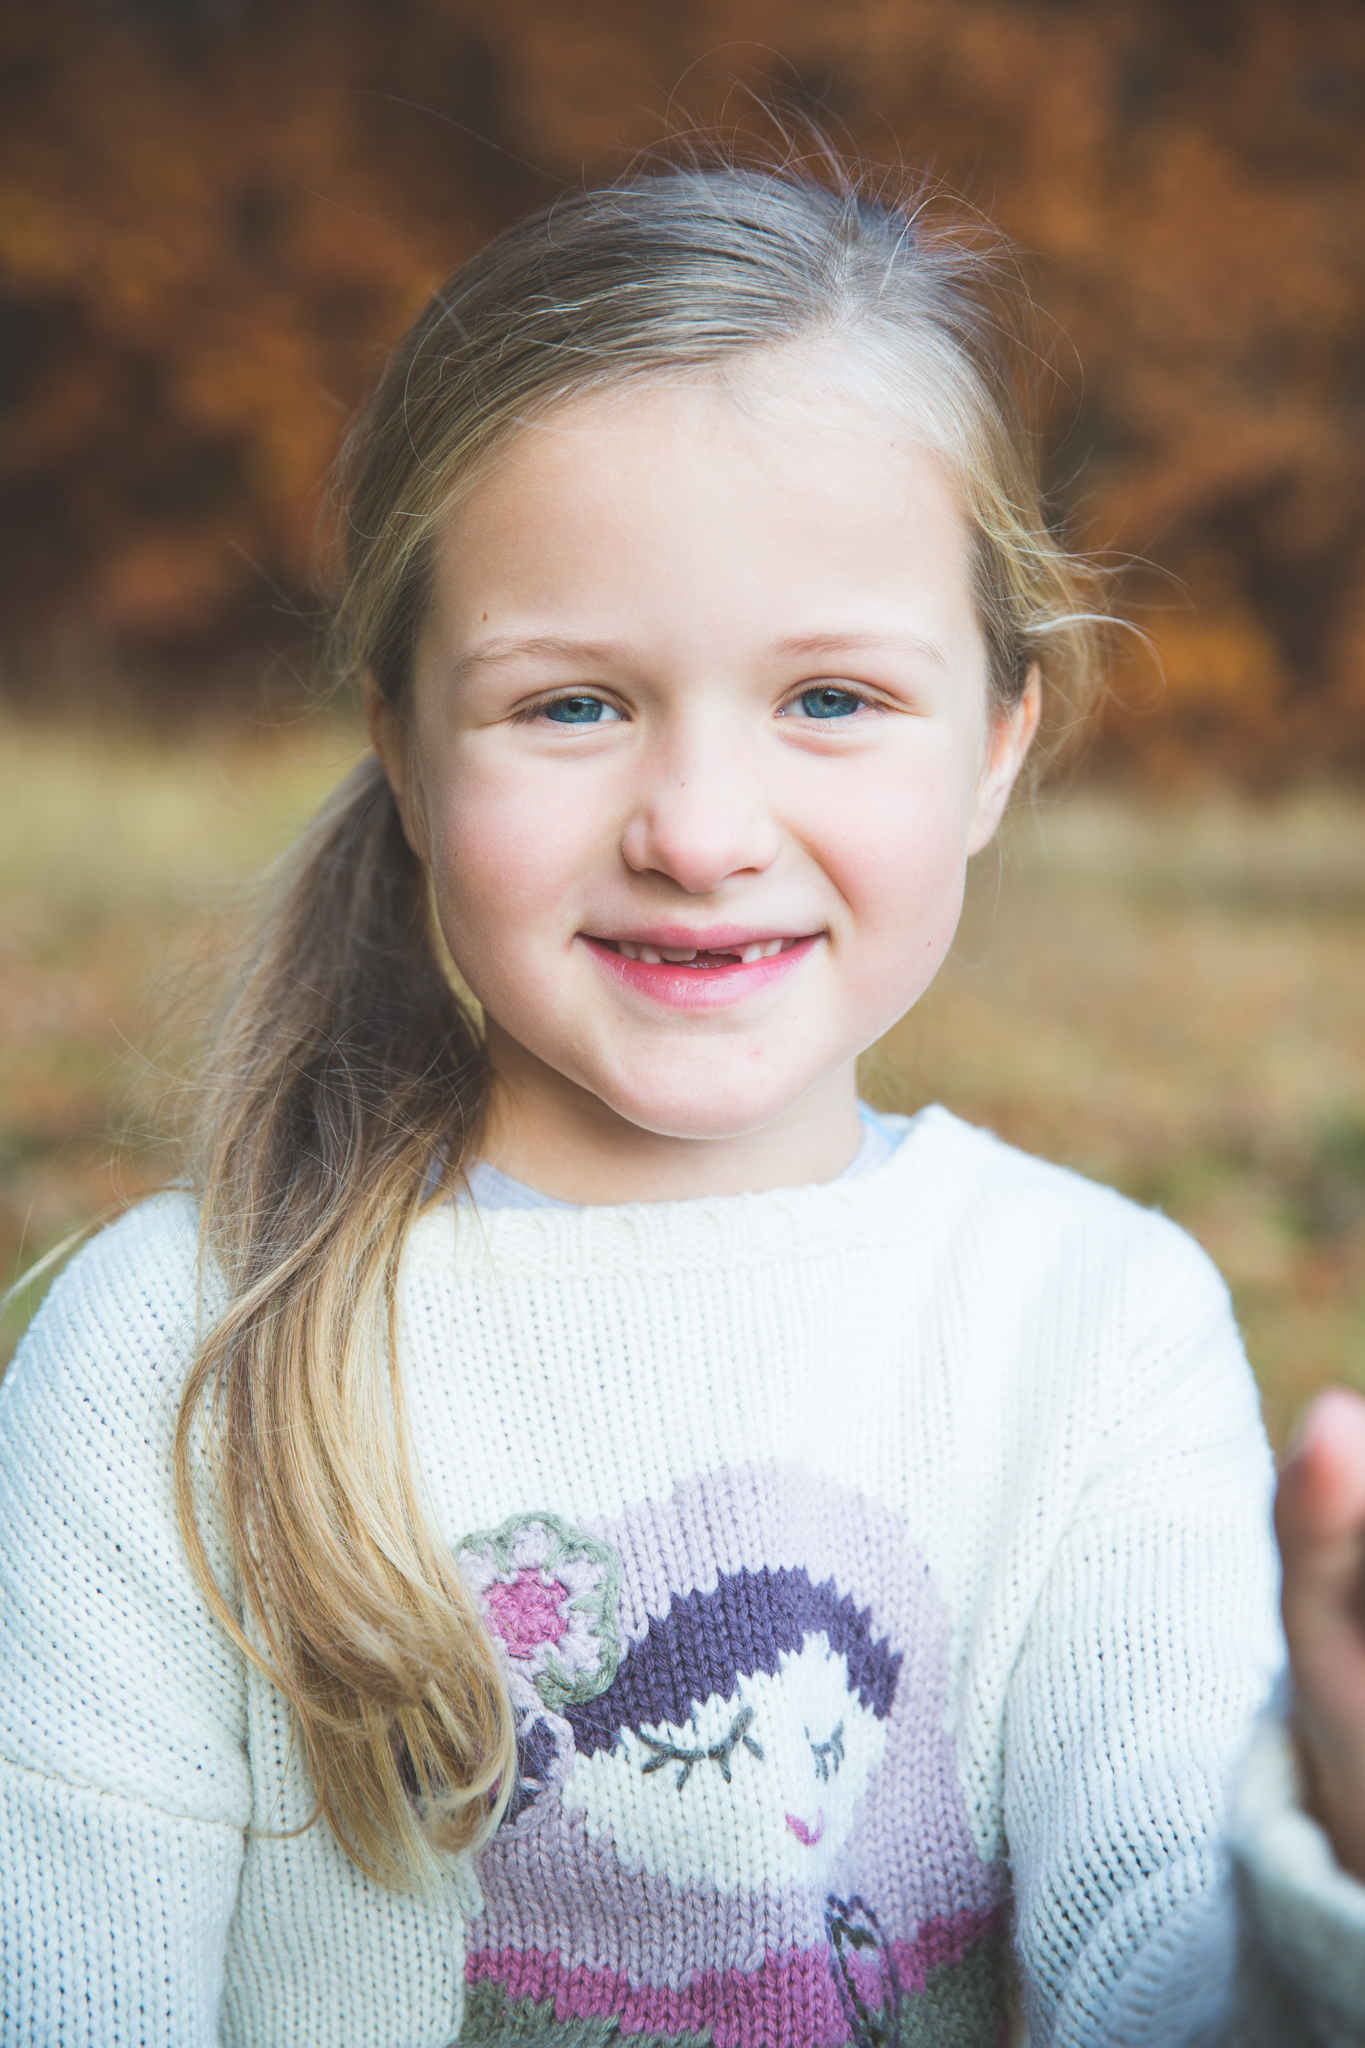 ViOli-Photography-barnfotograf-familjefotograf-Asarum-karlshamn-Blekinge